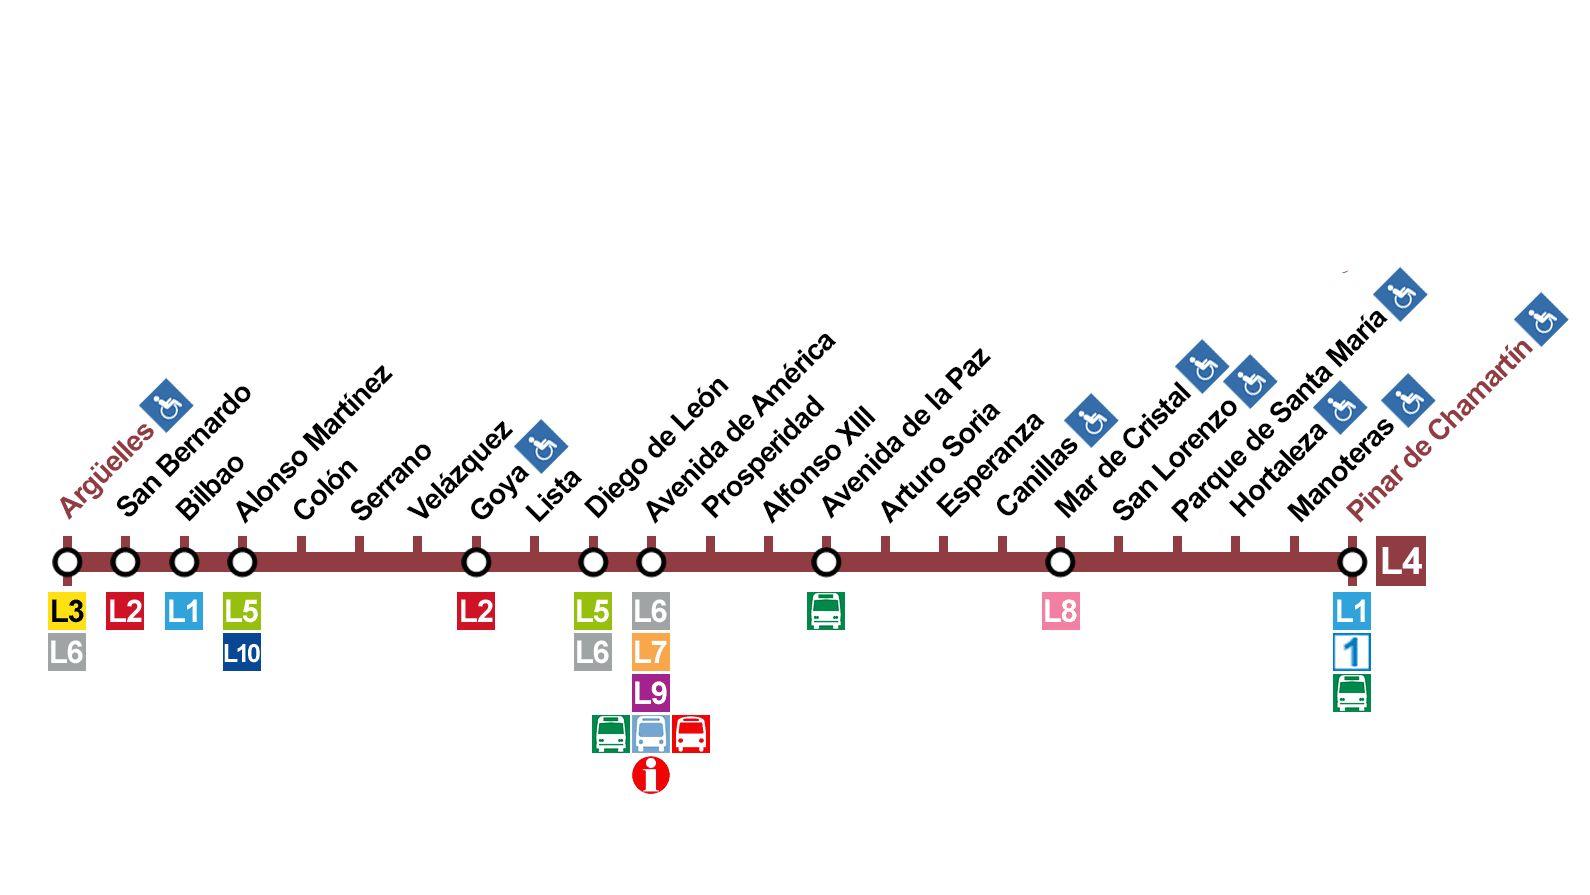 linea 4 cierra